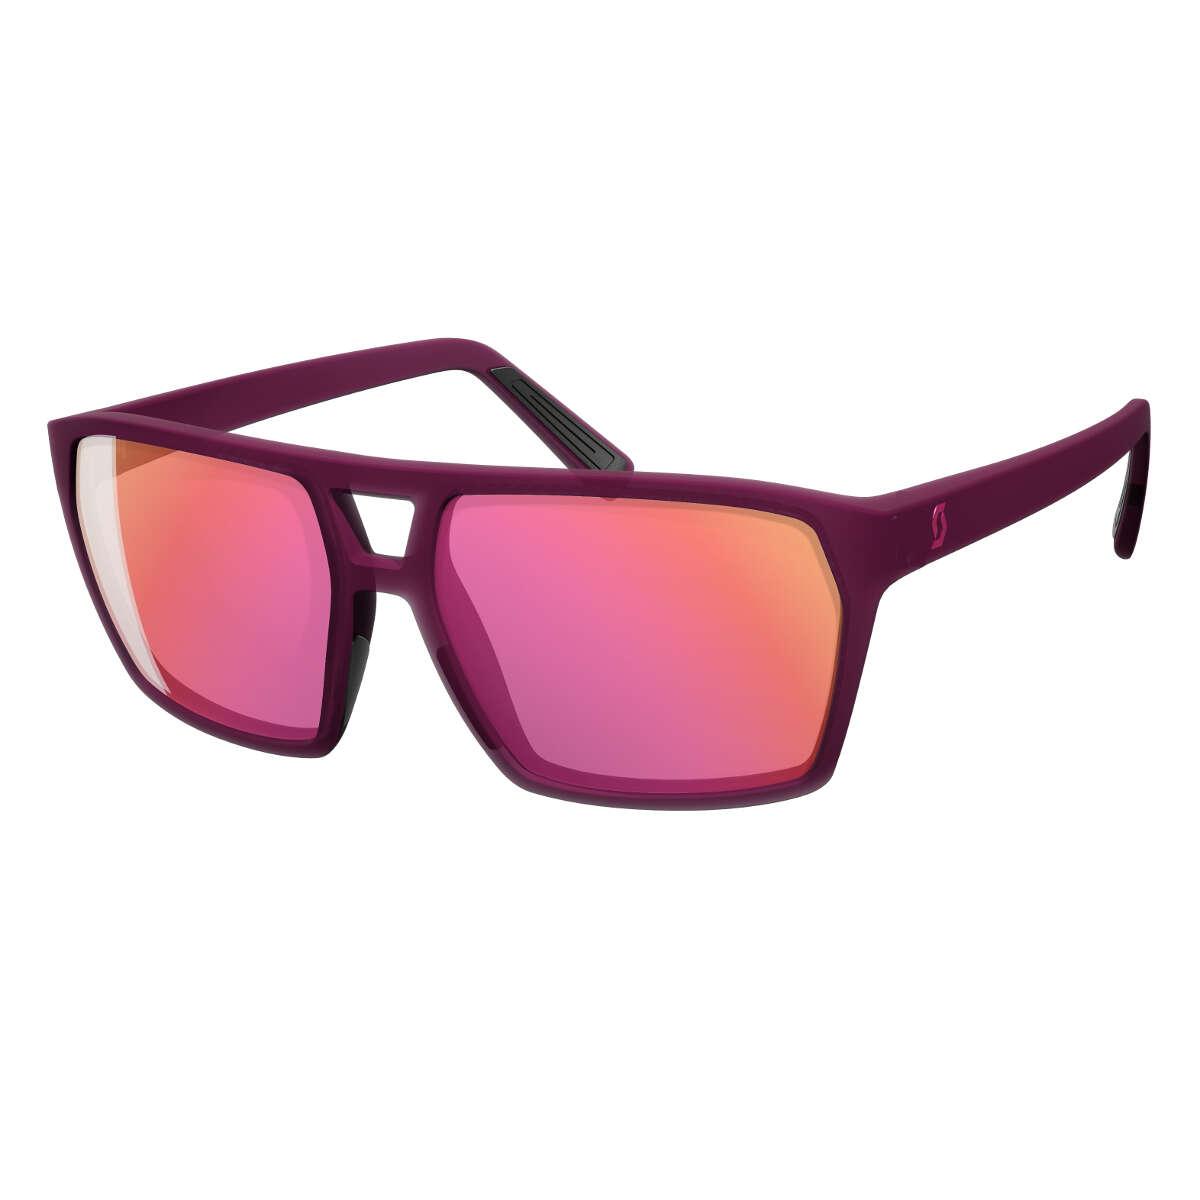 Scott Sonnenbrille Tune purple pink chrome KiPpDrT